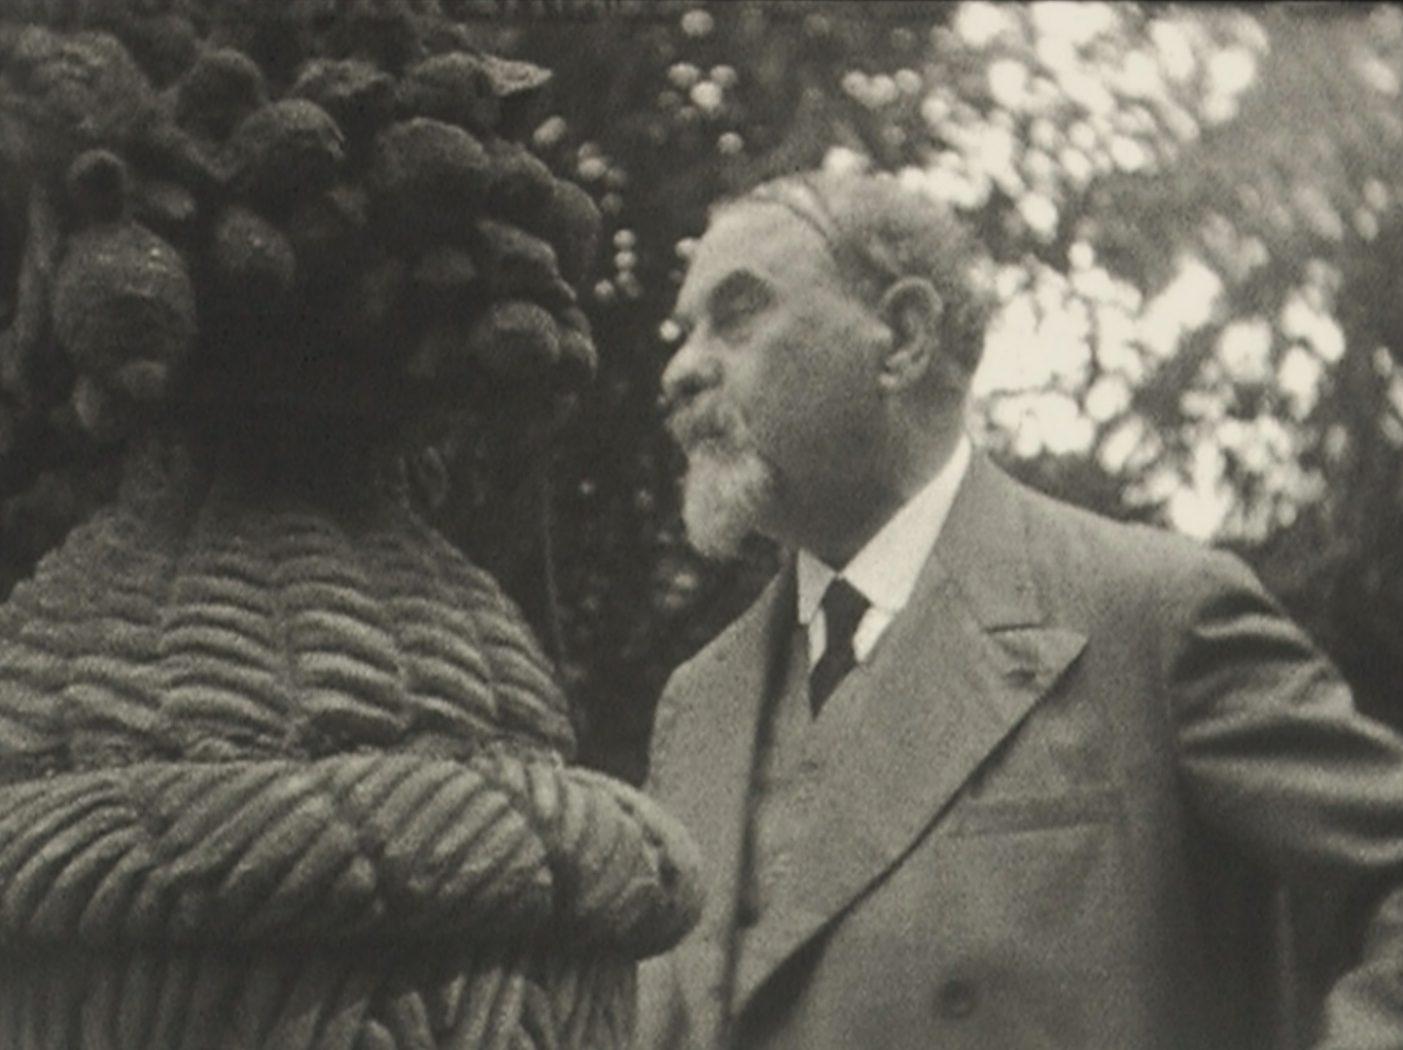 1935. discour de Le Sidaner Ö Gerberoy